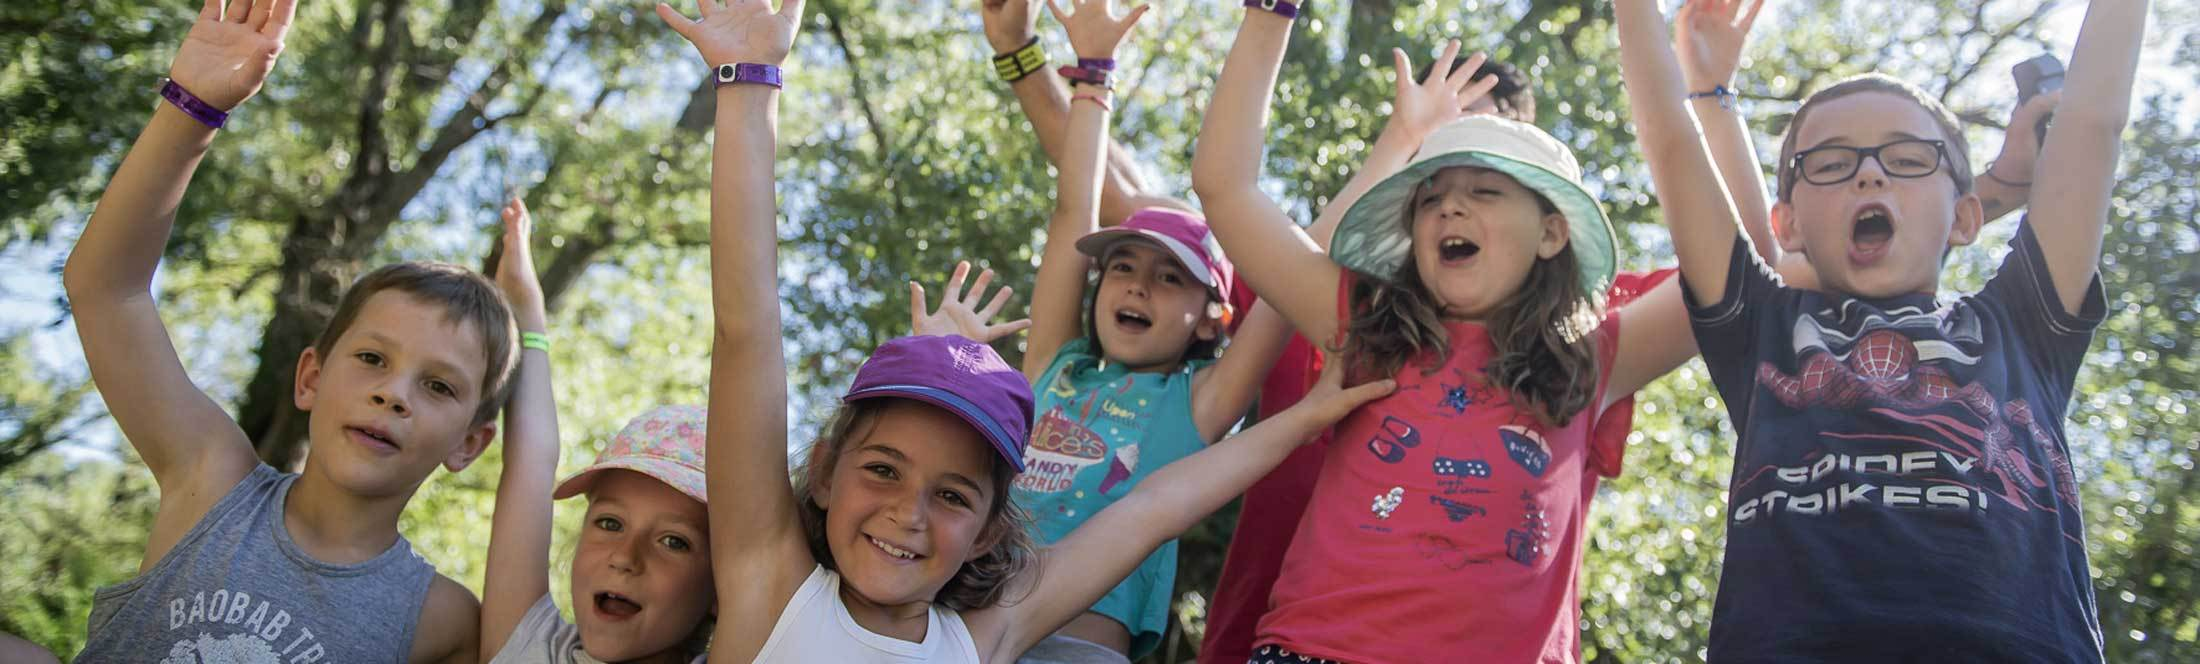 Club enfants village vacances